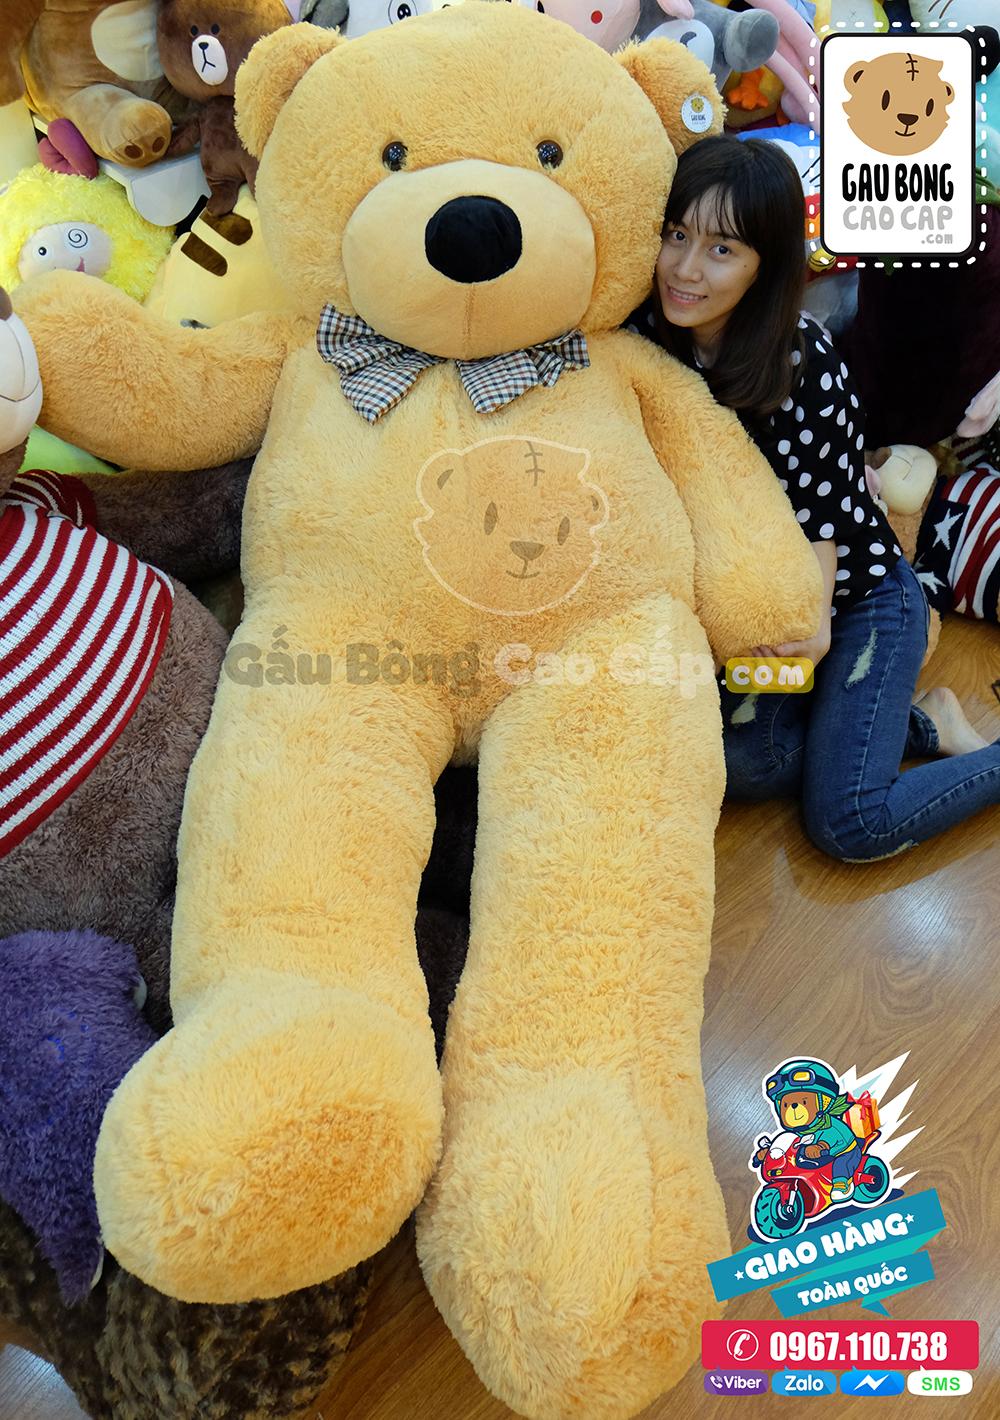 Gấu Teddy BOYDZ Nơ Caro 2m